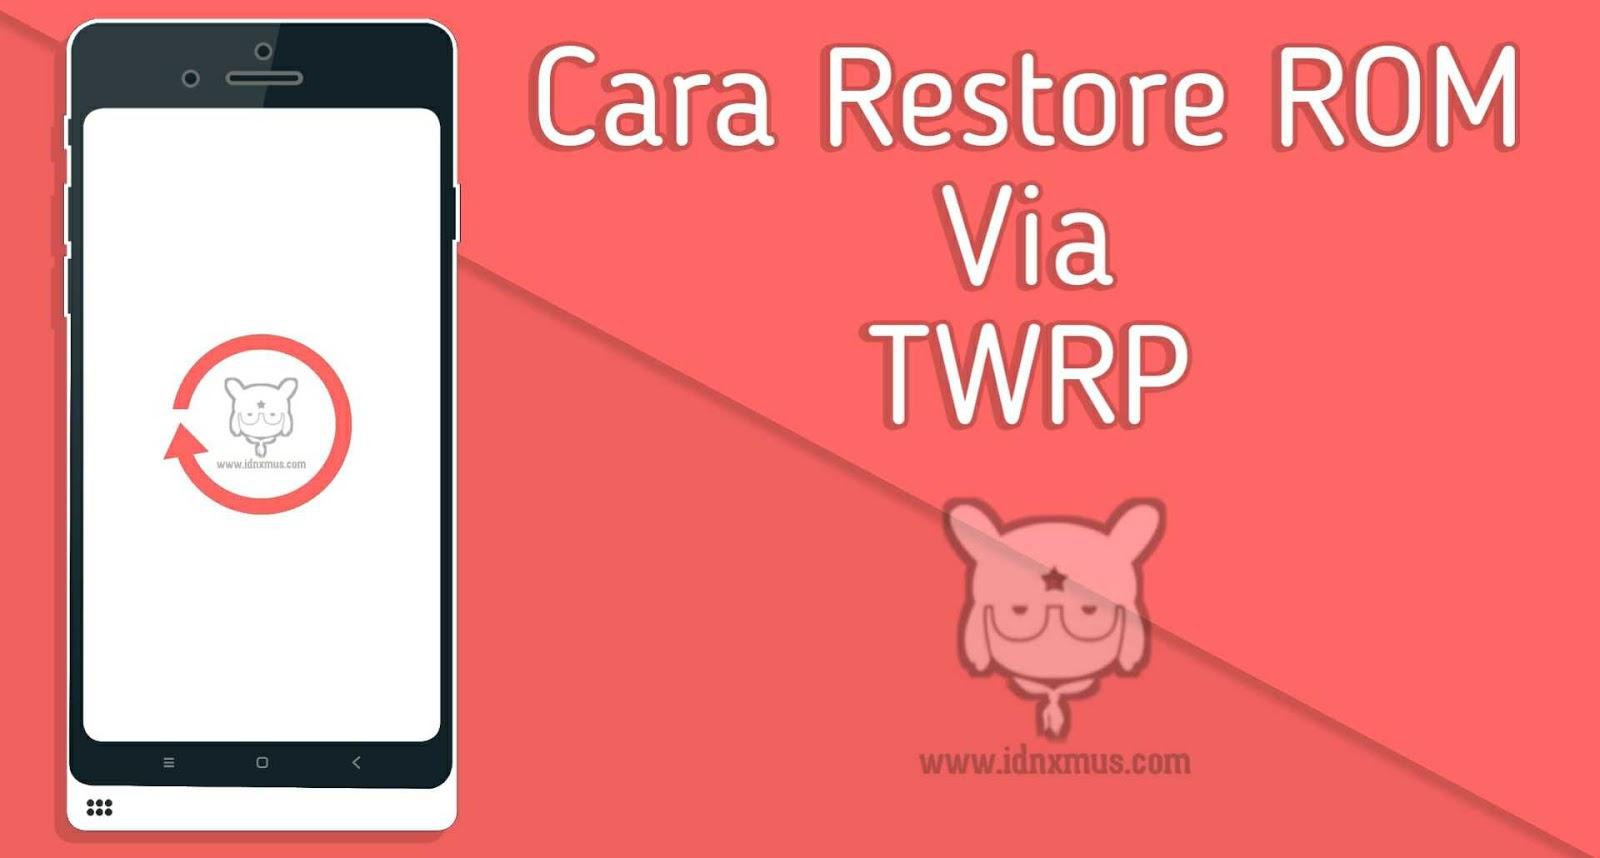 Cara Restore ROM Via TWRP